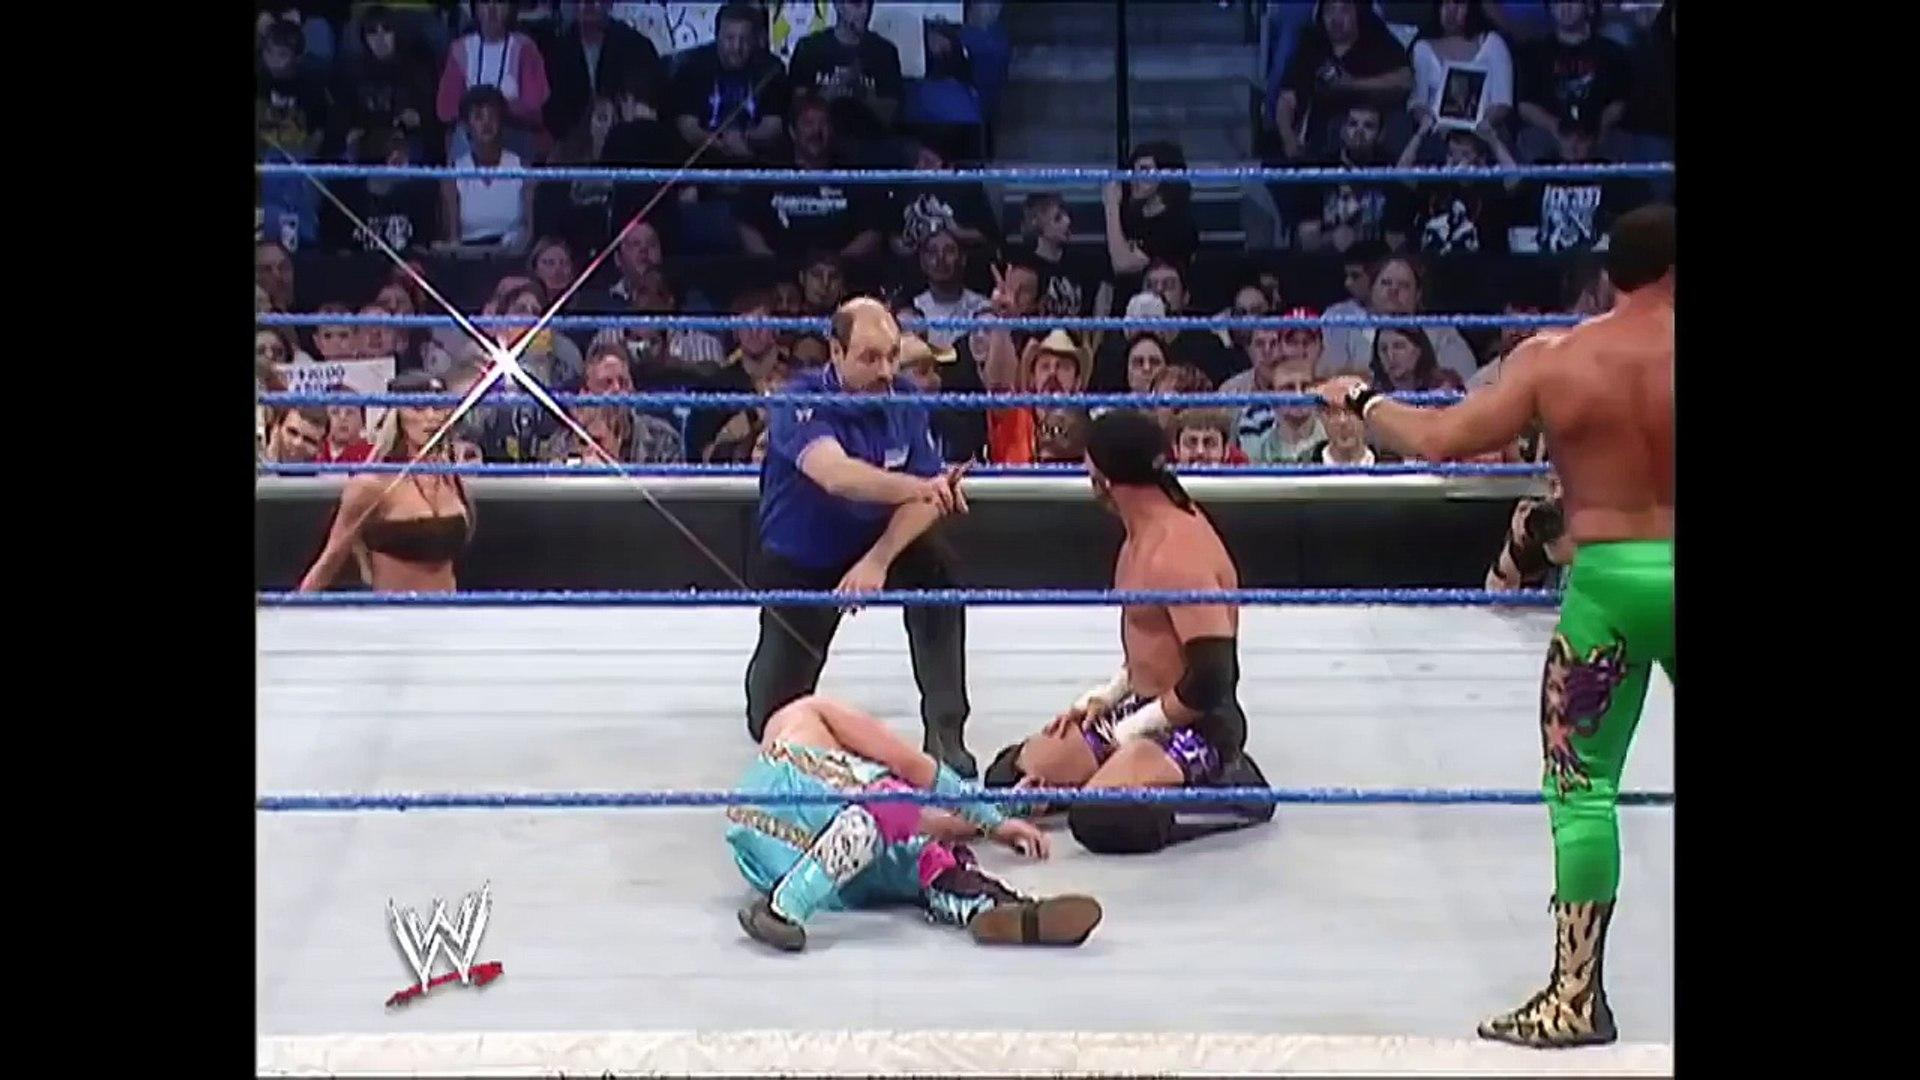 Brian Kendrick & Paul London vs Chavo Guerrero & Gregory Helms Part 2 (Part 1 In Descripti